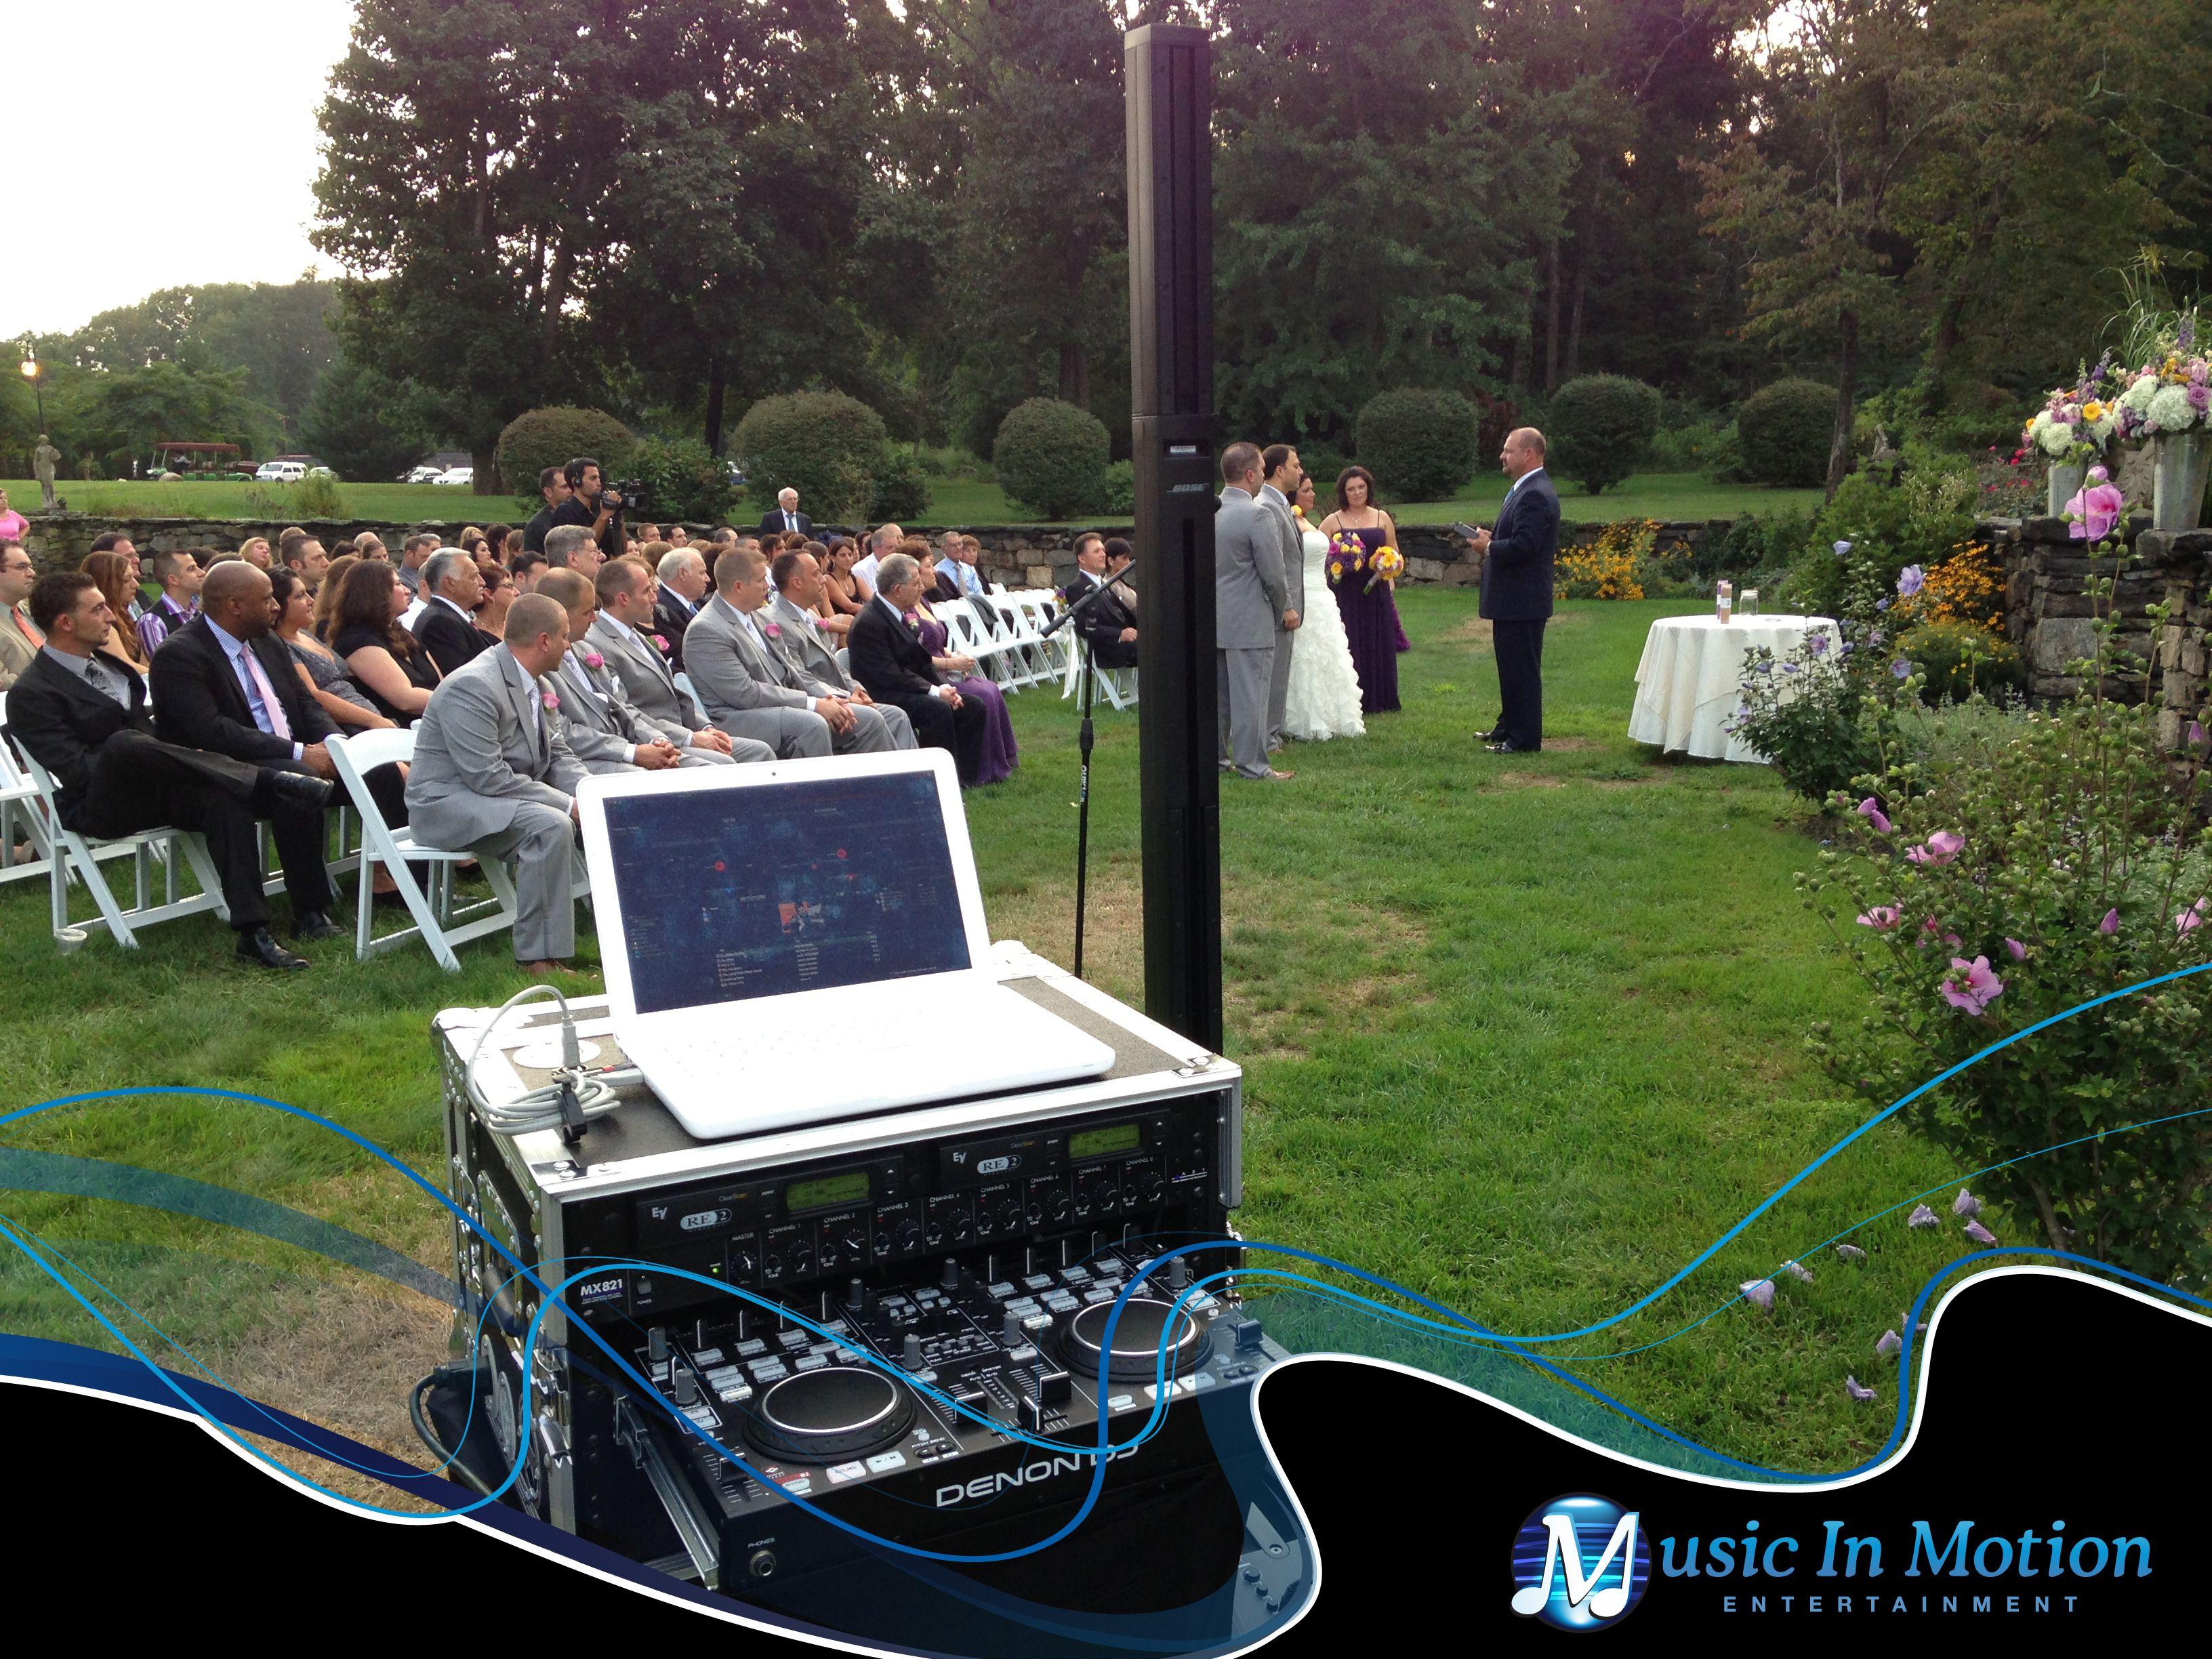 Music In Motion S Compact Dj System Set Up For A Ceremony In The Sunken Garden At St Clement S Castle Portland Ct Dj System Wedding Dj Sunken Garden